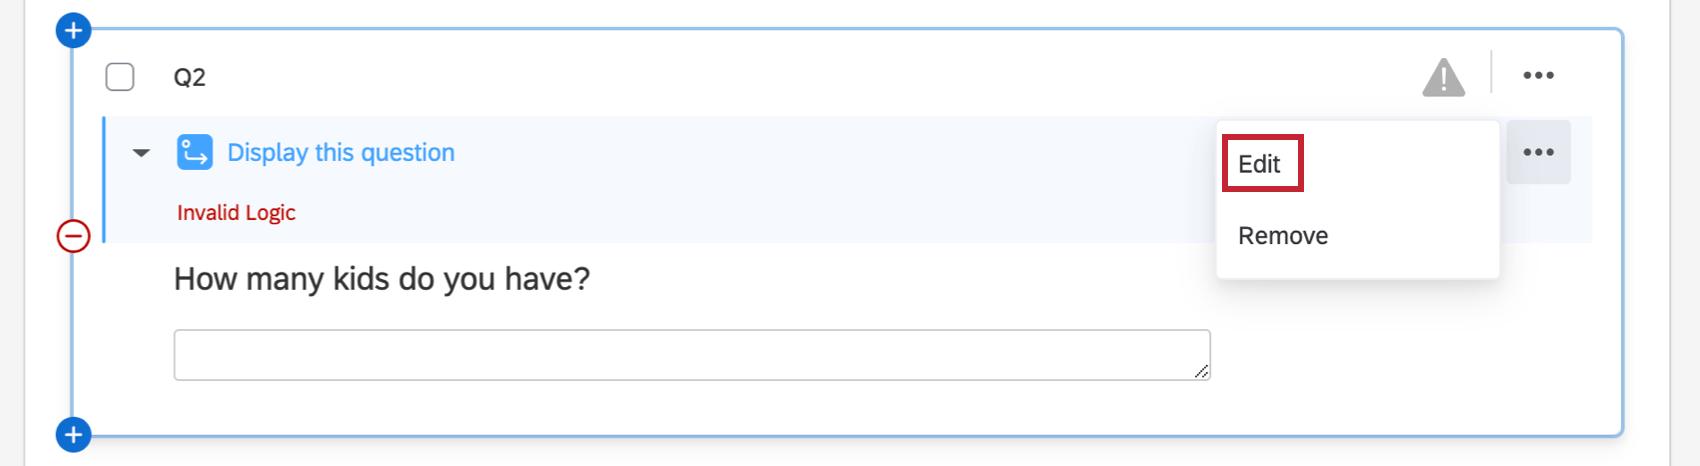 Editing invalid logic